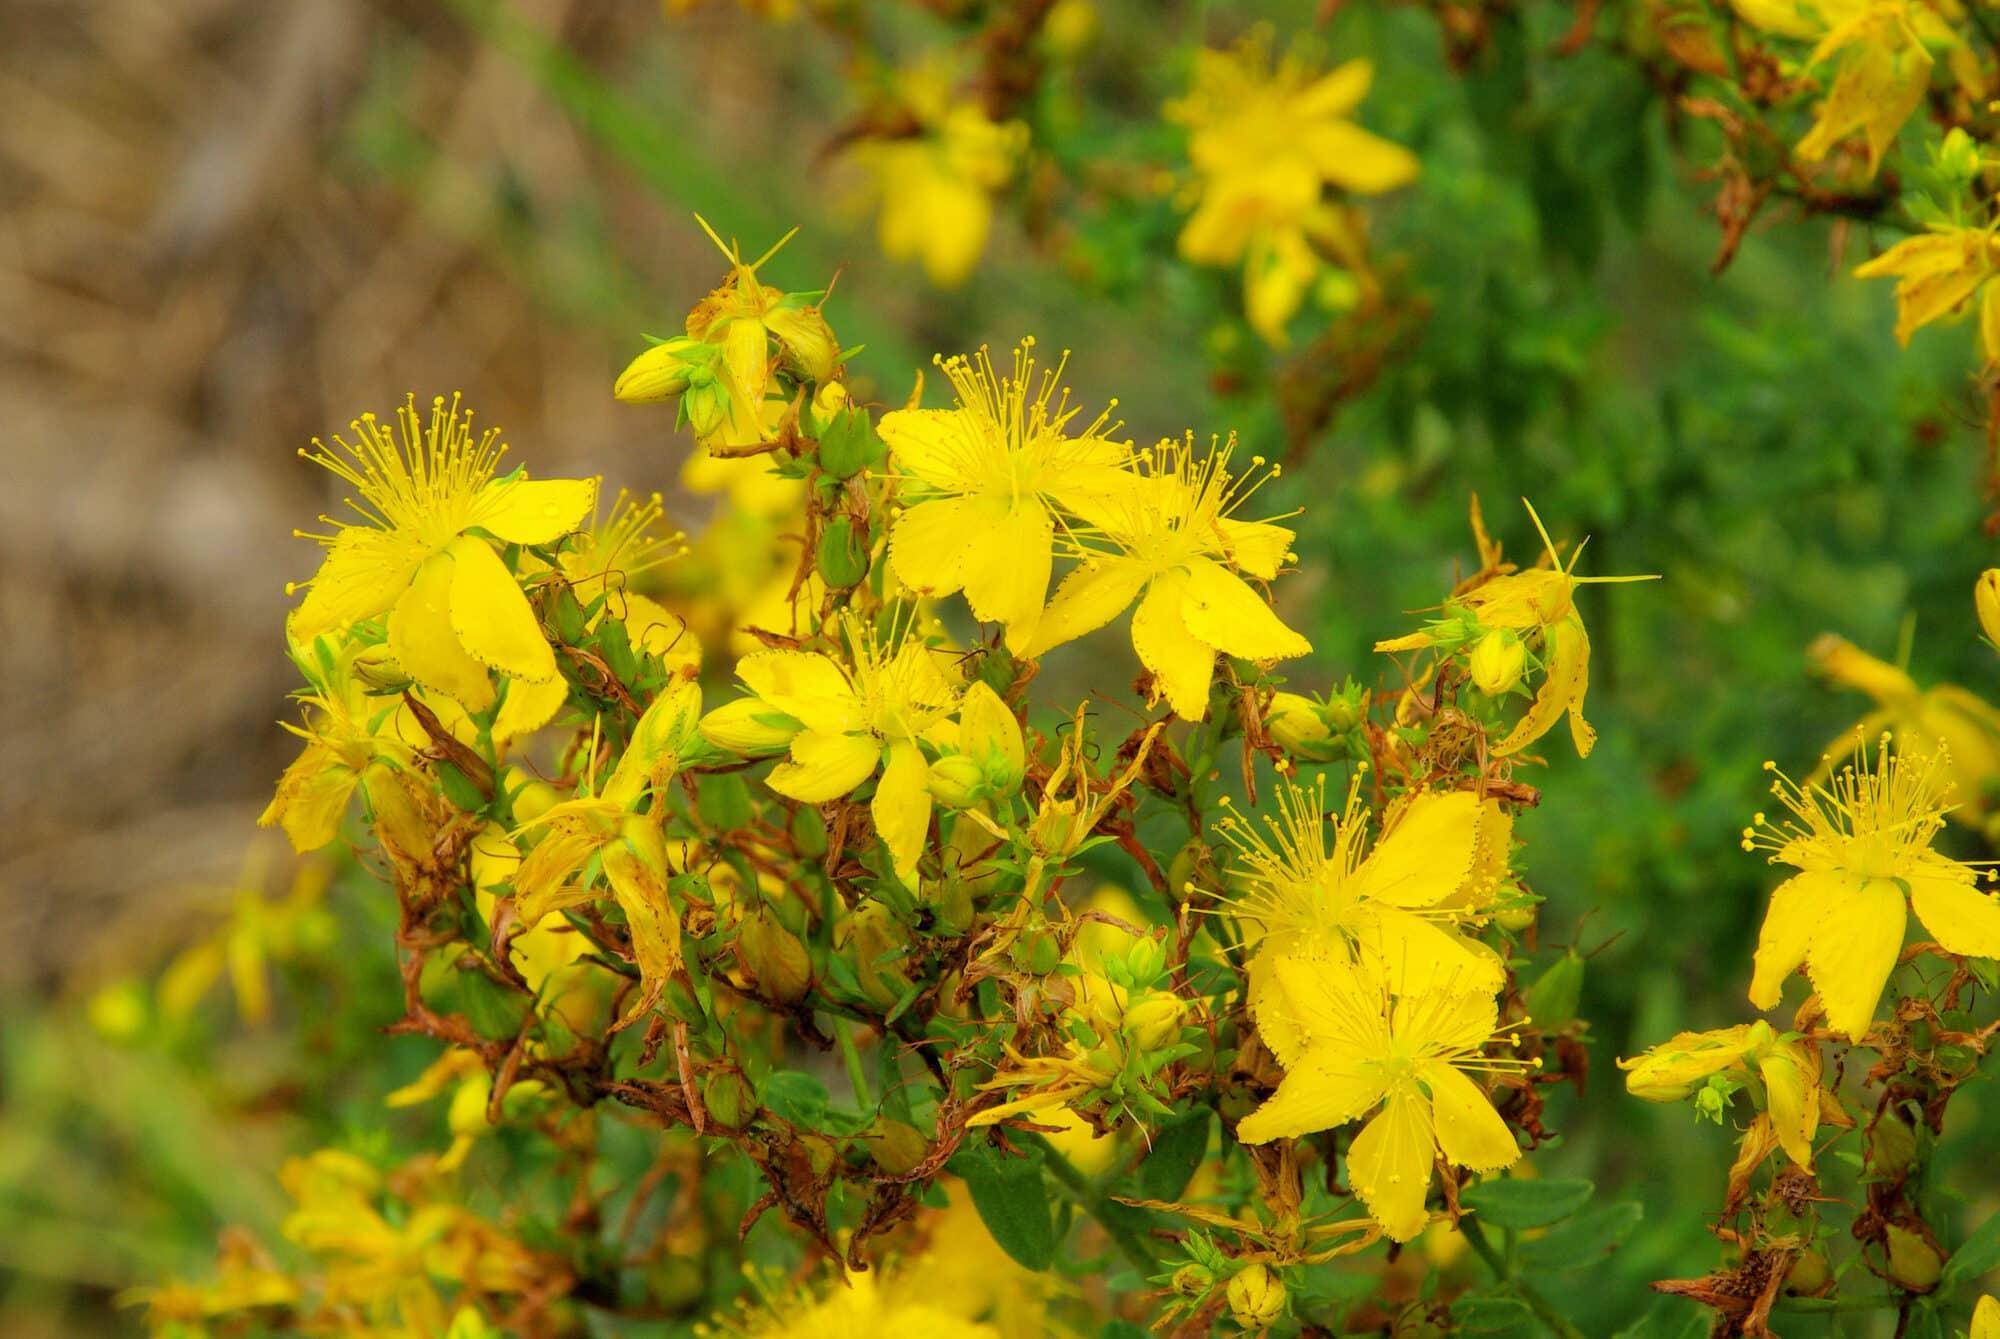 St. John's Wort: A Proven Herbal Antidepressant